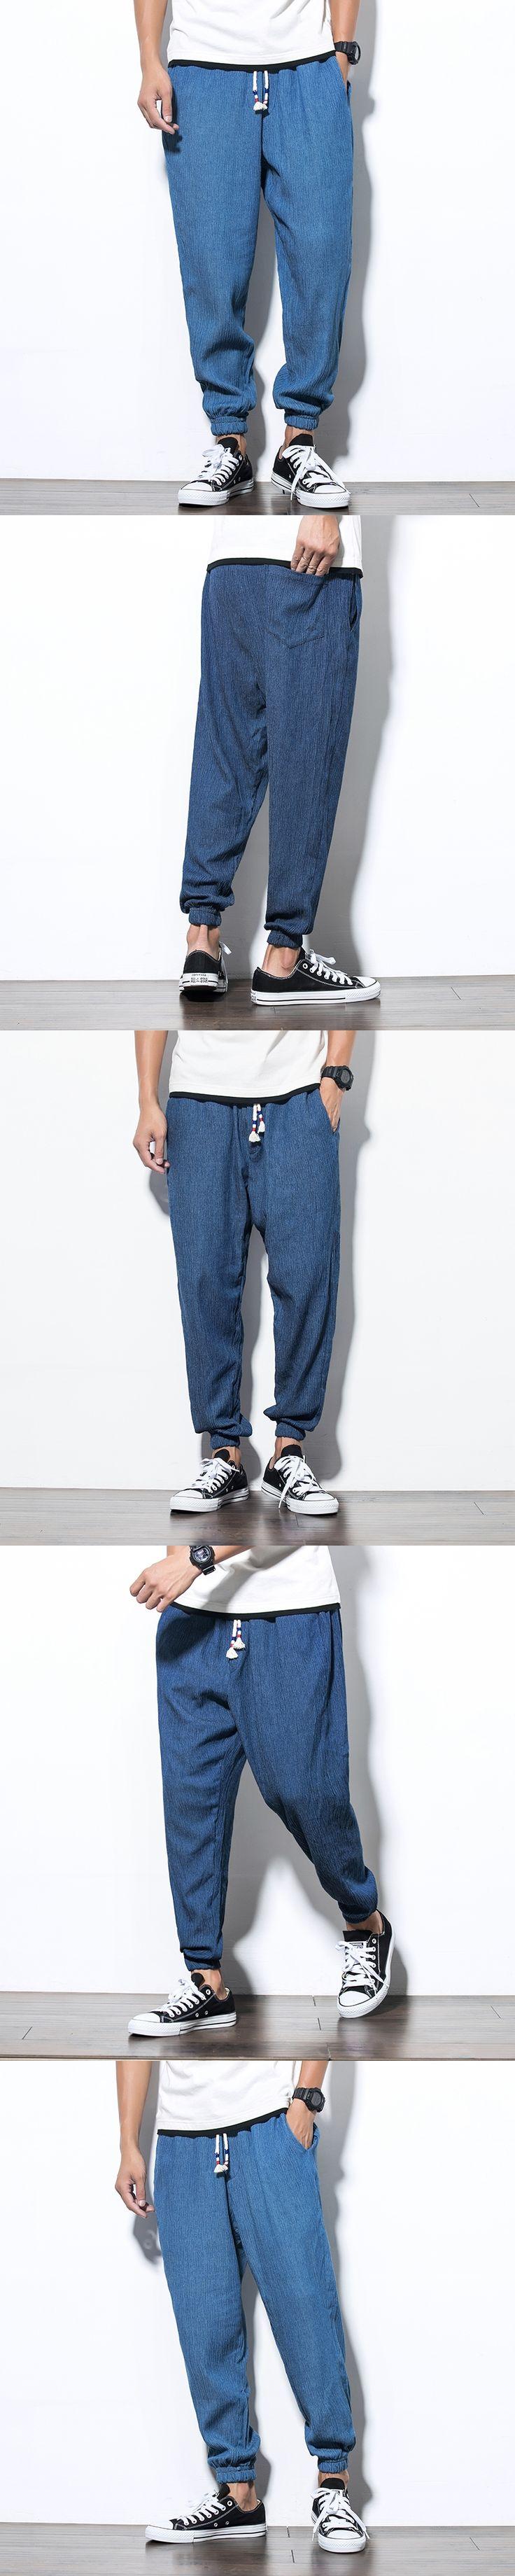 2017 Chinese Style Mens Pants Slim Comfortable Male Harem Pants Hip Pop Pants Man Sweatpans Boys Jogger Big Size M-5XL